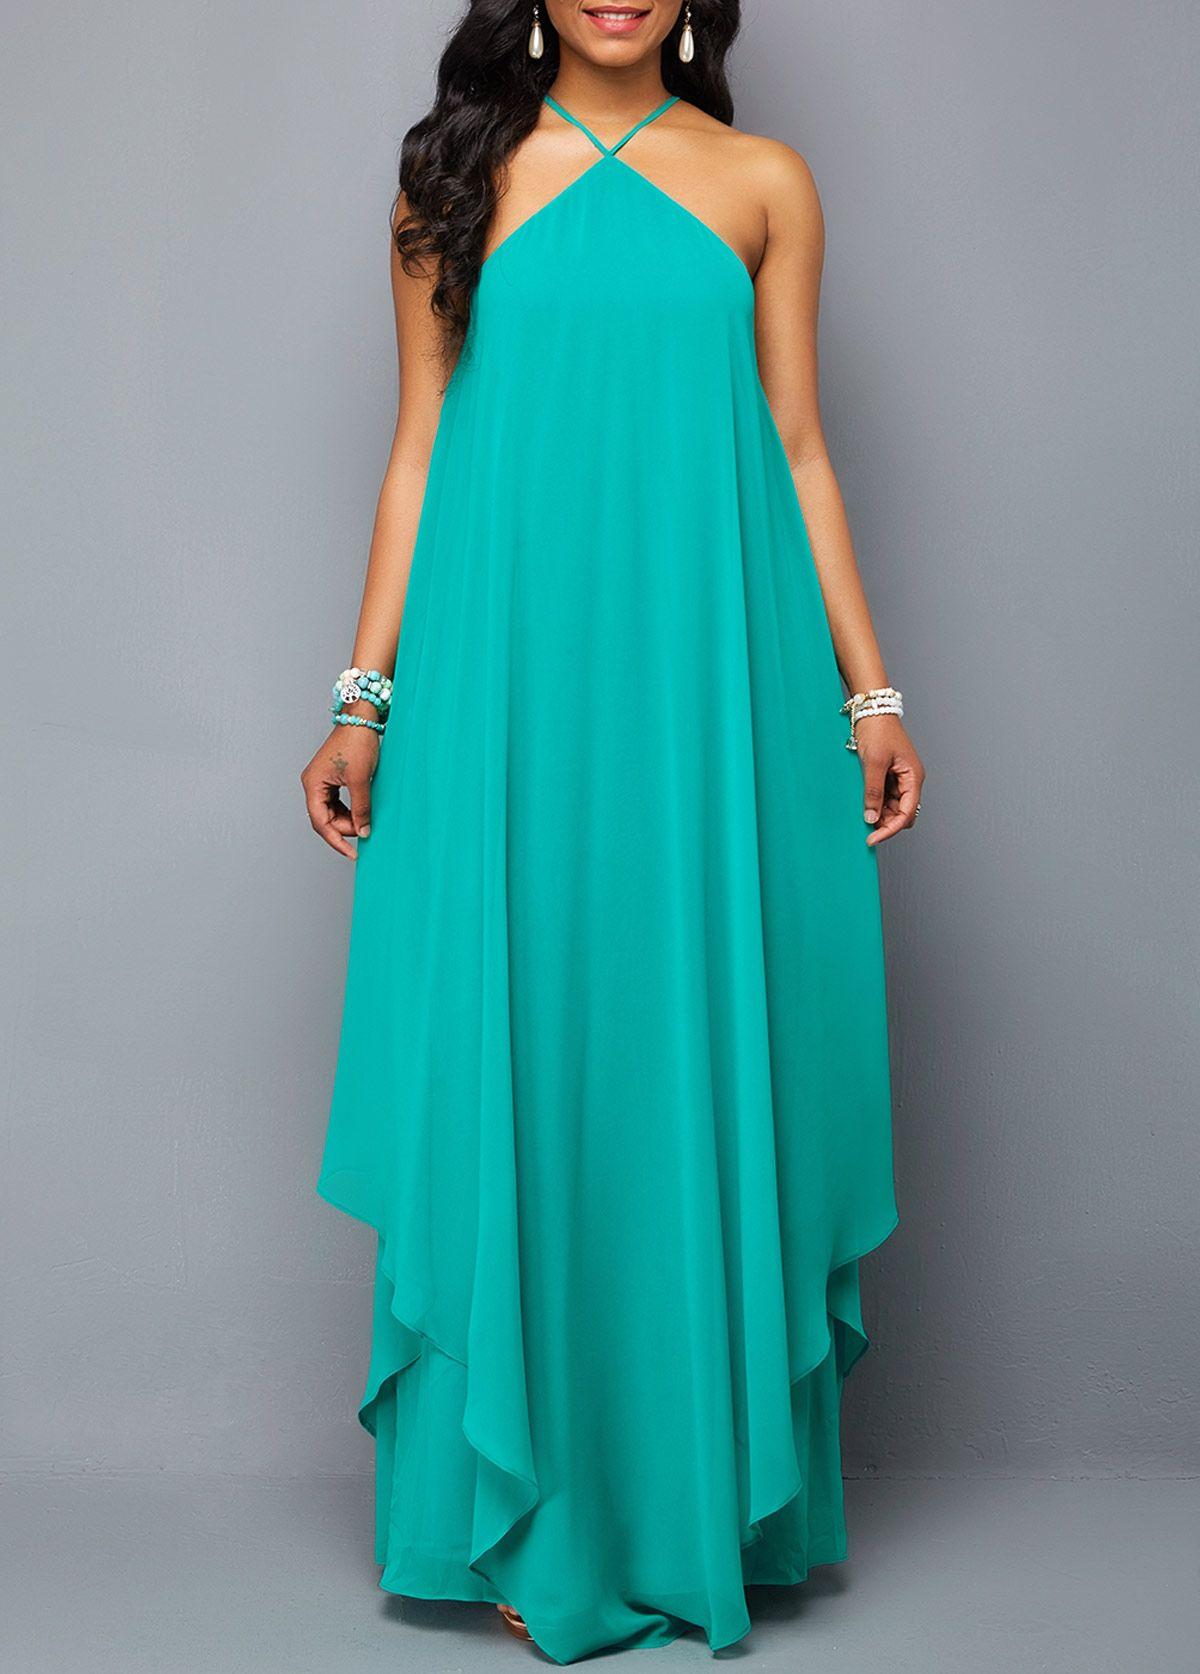 Cross Neck Tie Back Turquoise Chiffon Dress Dress Dresses Chiffondress Afflink Fashion Womensfash Chiffon Dress Women S Fashion Dresses Womens Dresses